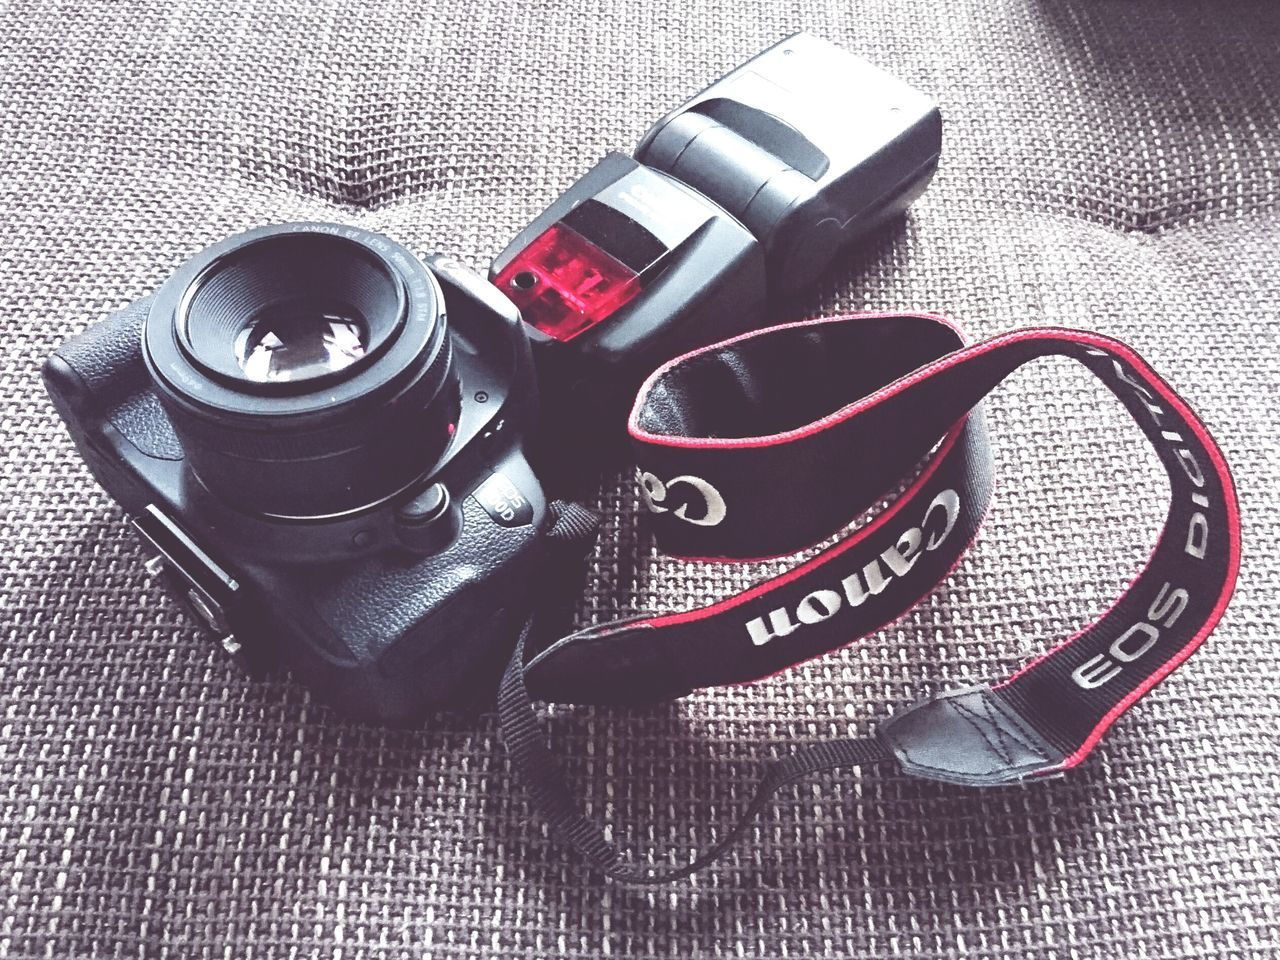 black beauty 📸❤ Camera - Photographic Equipment Canon700D Camera Canon 50mm F1.8 Festbrennweite Photography Black BlackBeauty Objektiv Hobbyphotographer Hobbyphotography Mobilephotography Black And Red Red Schwarz Equipment No People Flashlight Hobby